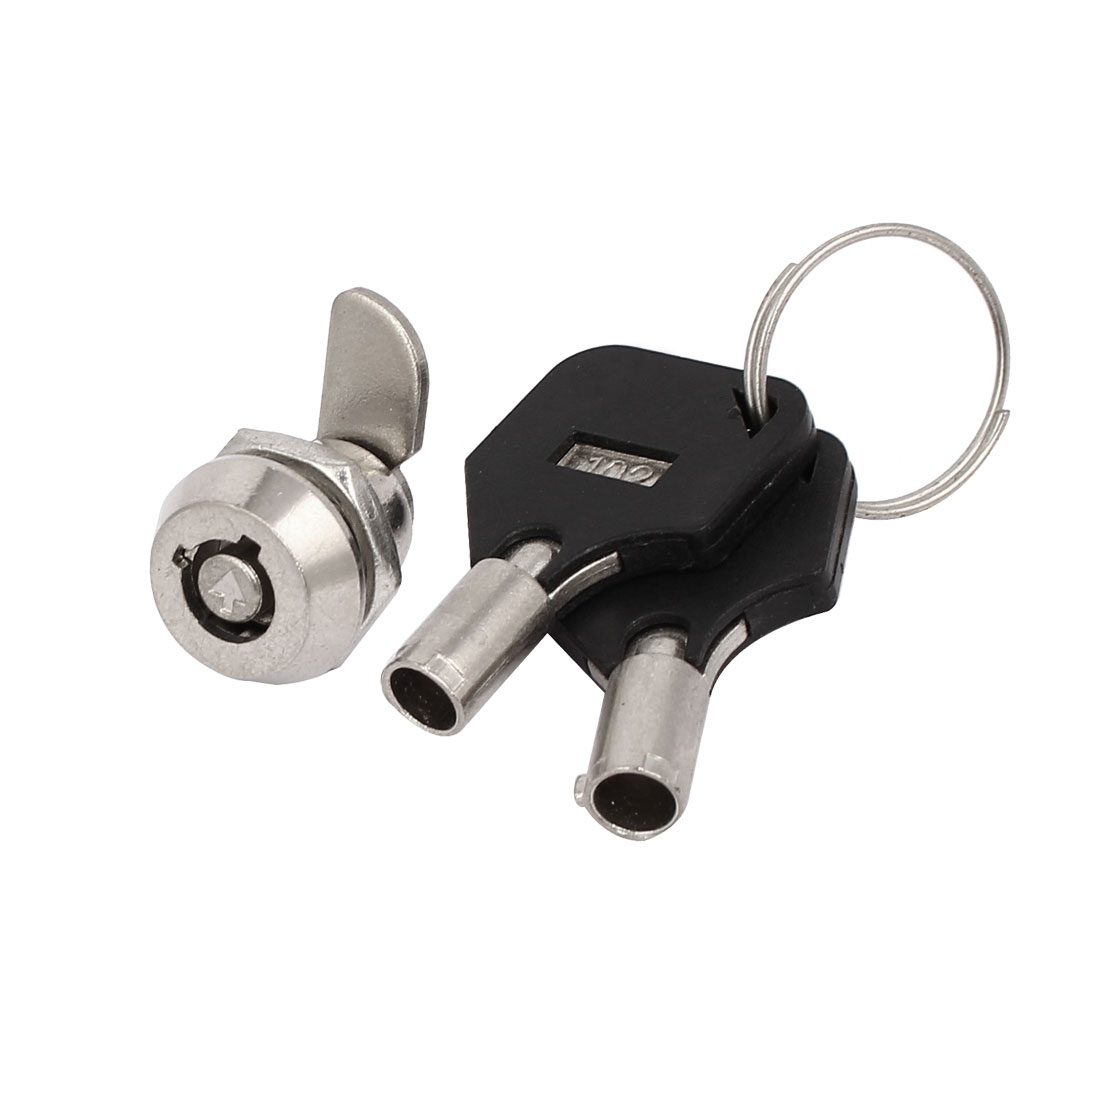 19mmx15mmx18mm Safety Keyed Tubular Cam Lock Locker Silver Tone w 2 Socket Keys